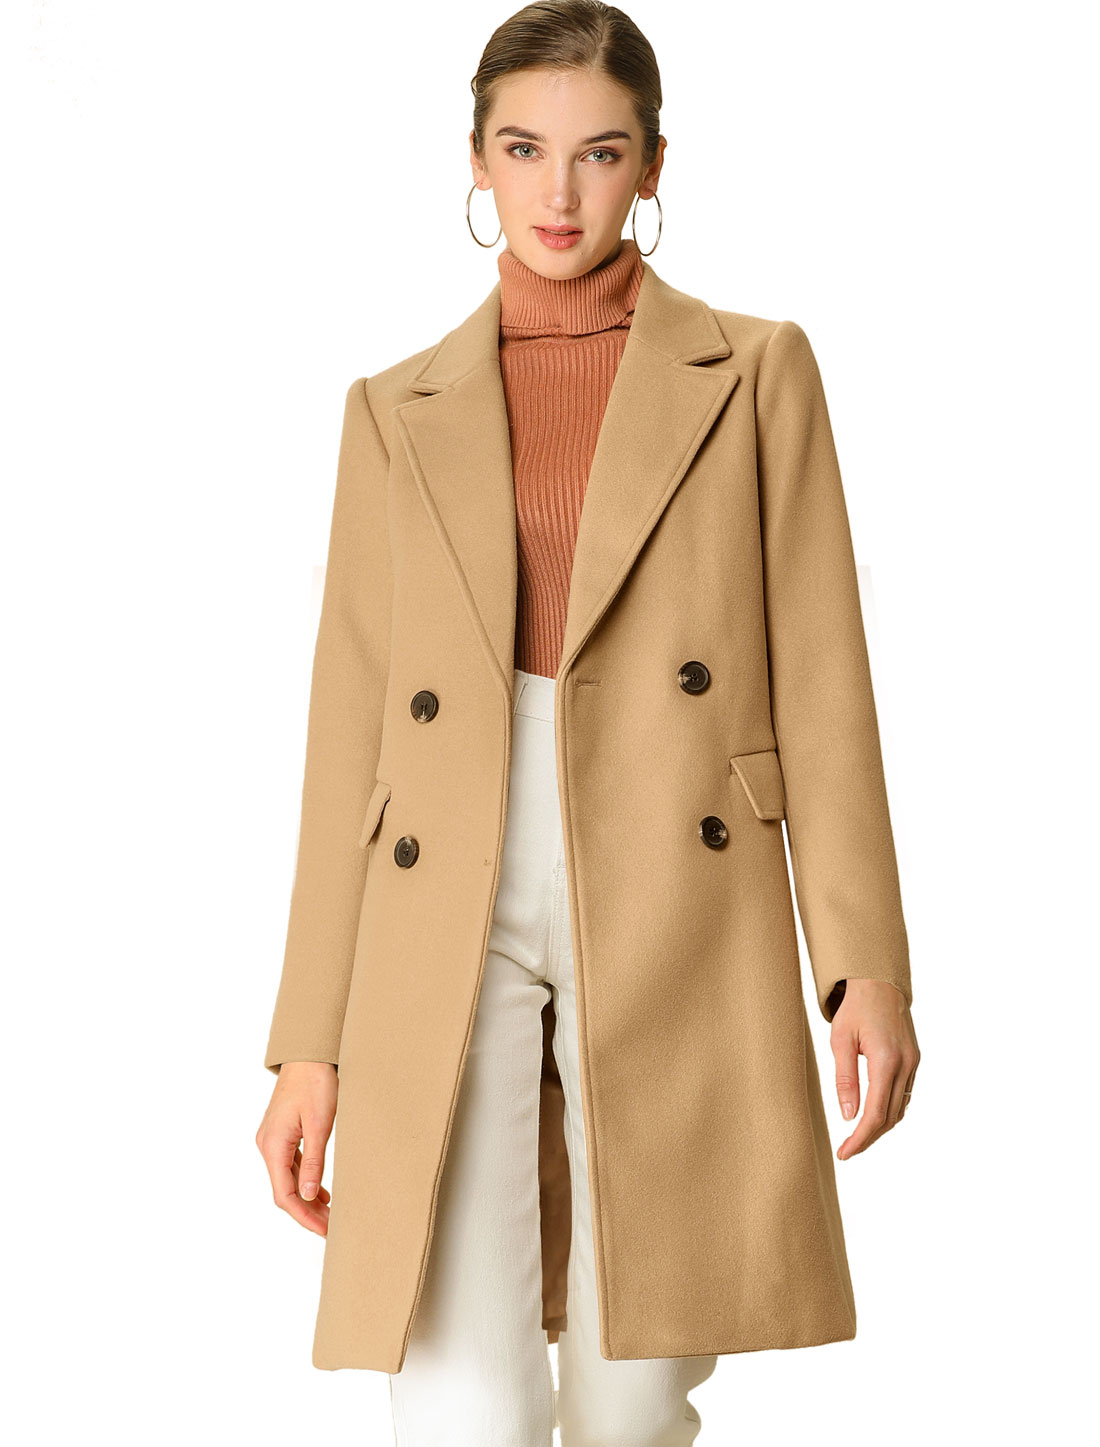 Allegra K Women's button Belt Long Jacket PeaTrench Coat Khaki M (US 10)